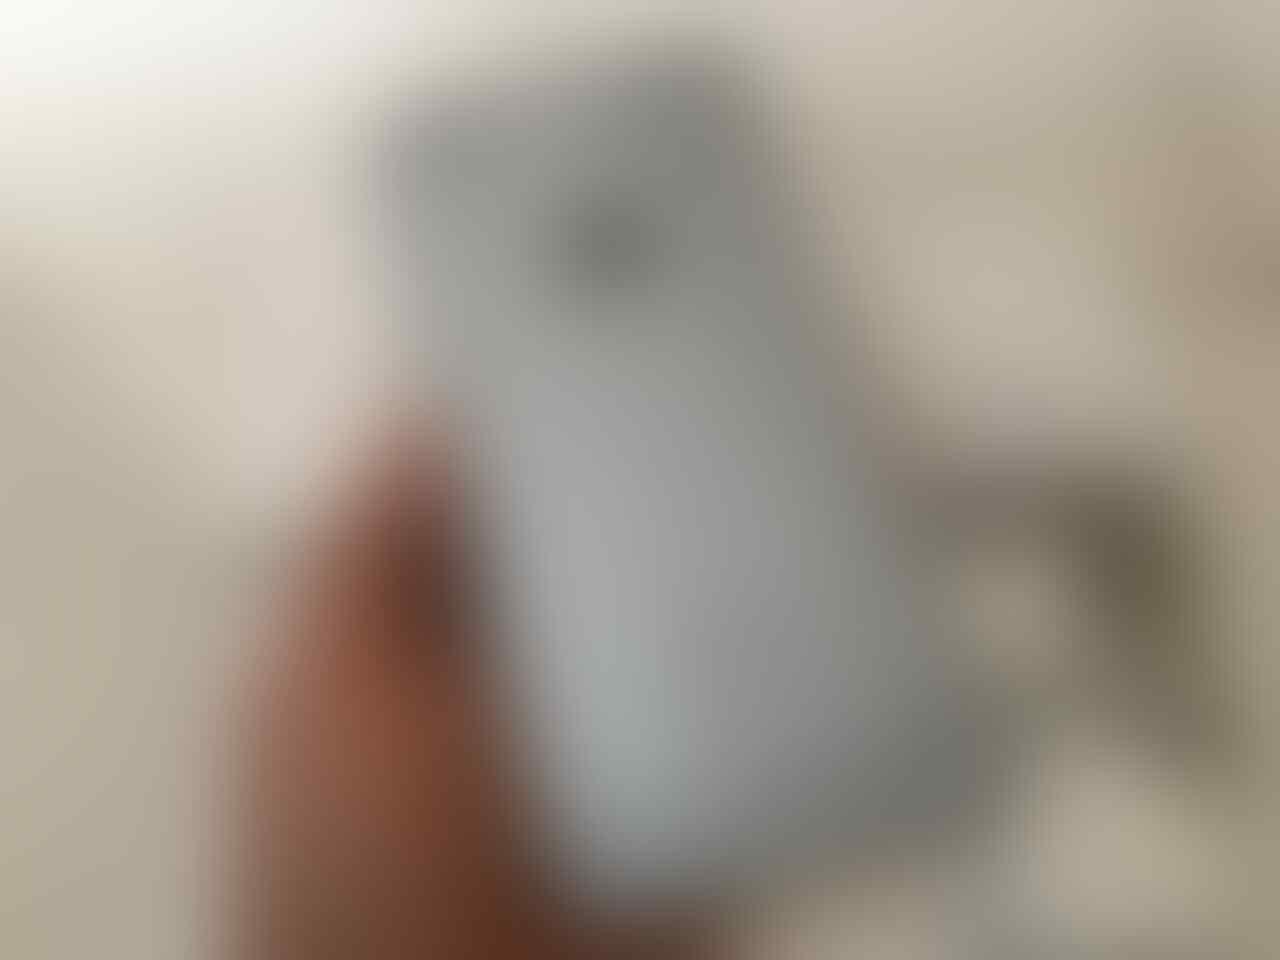 IPHONE 6 PLUS GREY 64GB IOS 10 FULLSET MULUUSS NORMAL MURAAHH 4100 SAJA [MALANG]